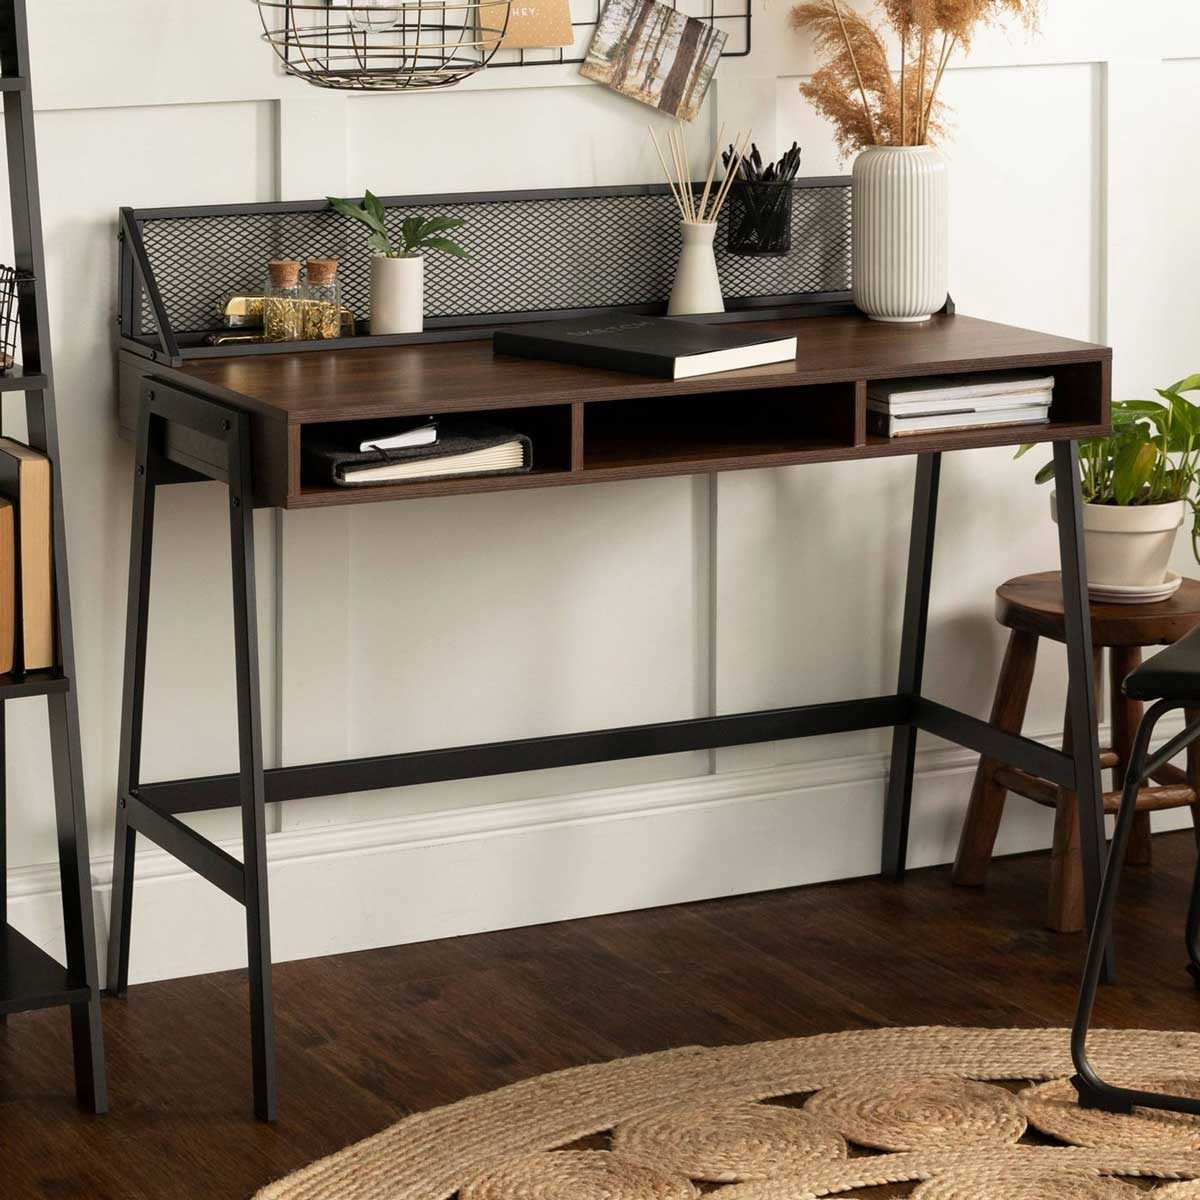 Desk with back